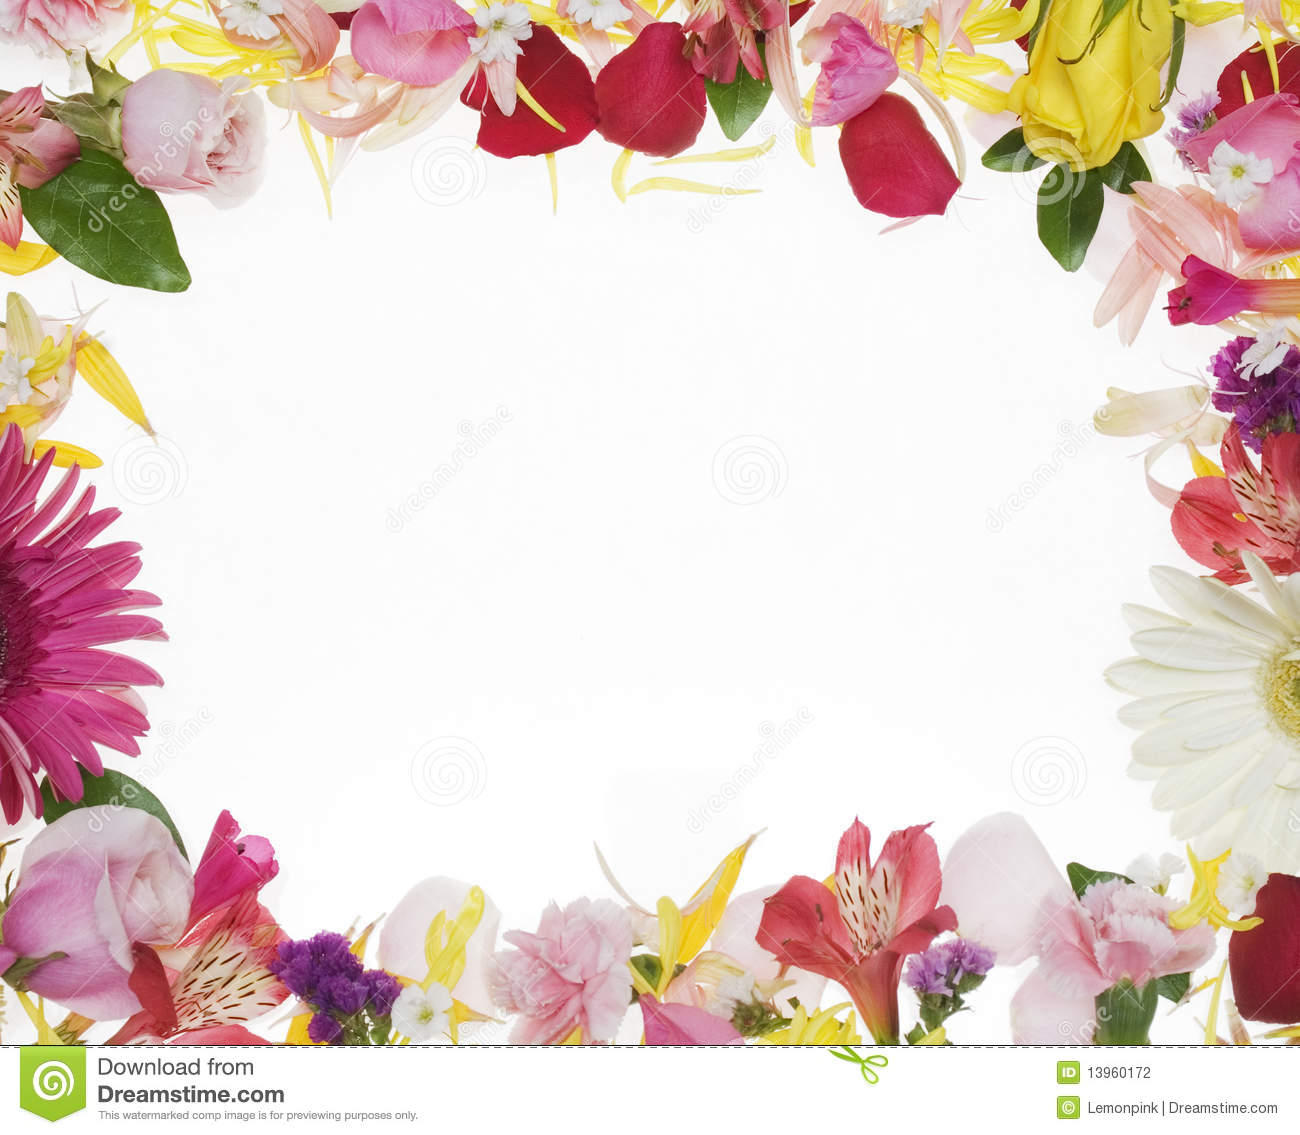 Swirl Wall Stickers Flower Boreder Clipground